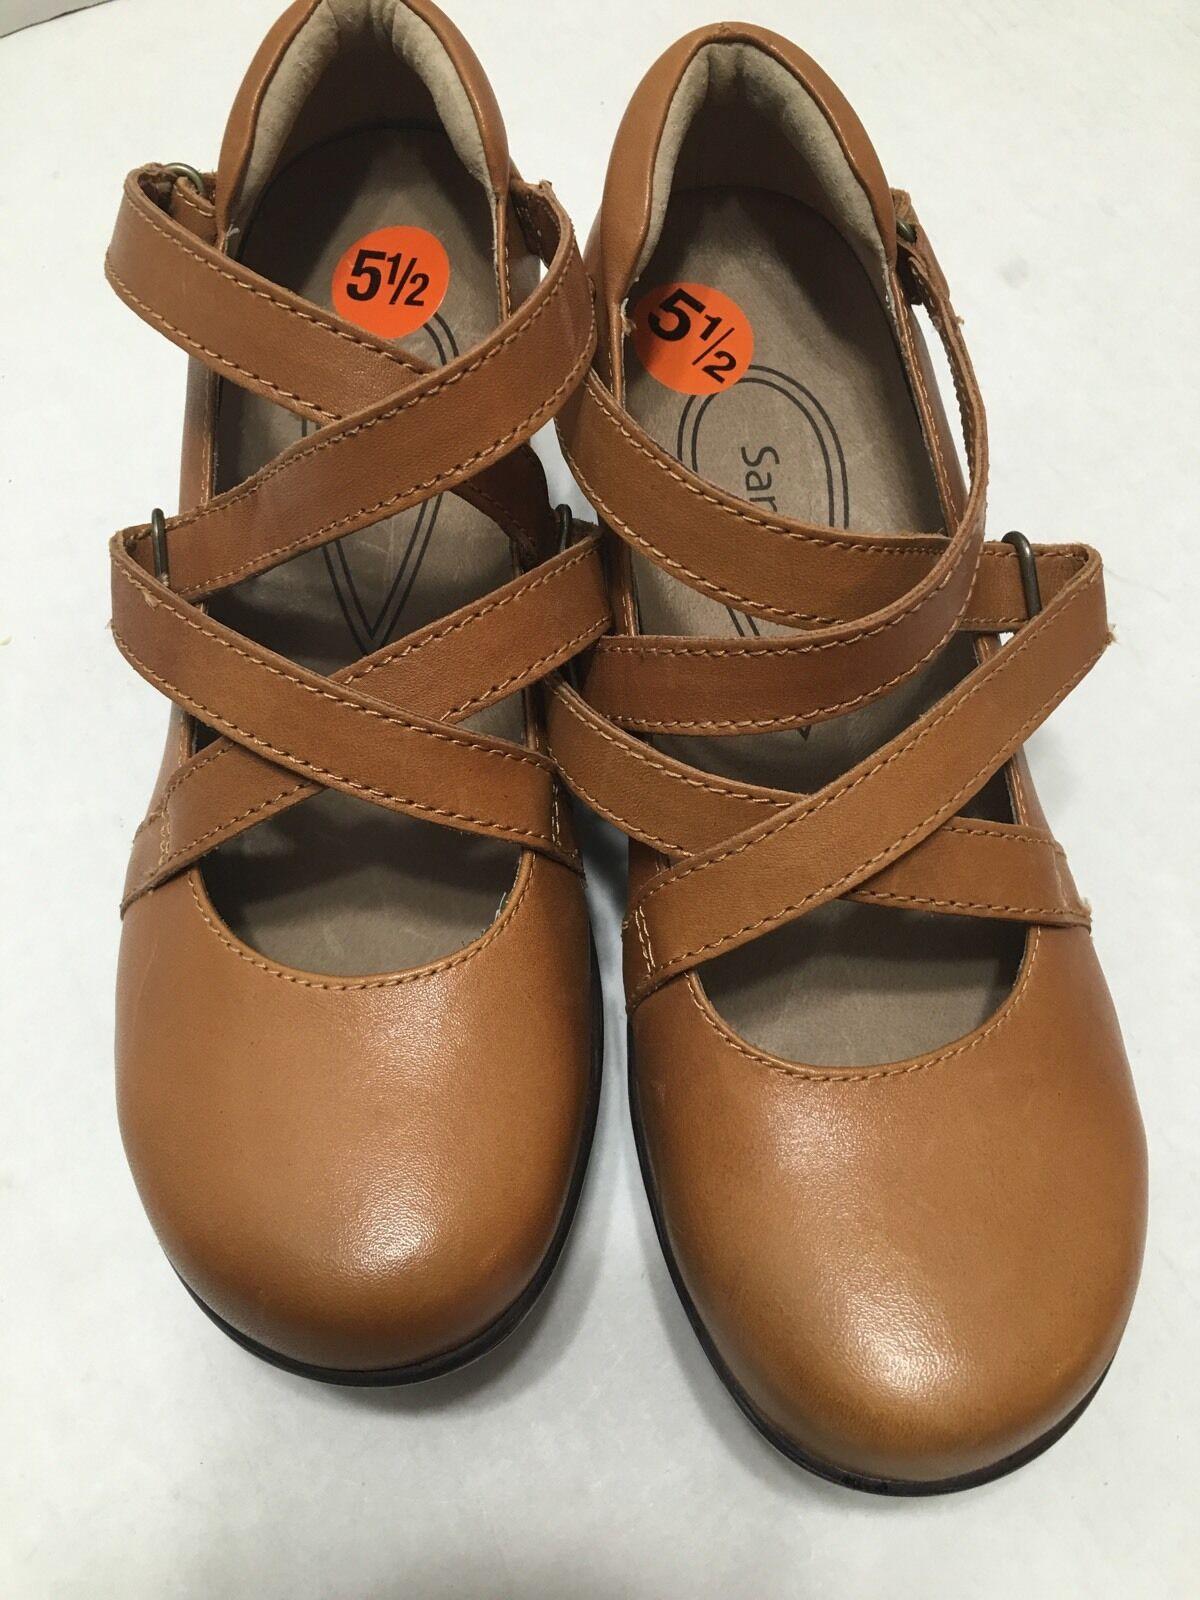 Sanita Neve Tan braun Leather schuhe Clogs sz 36 New US Größe 5.5-6